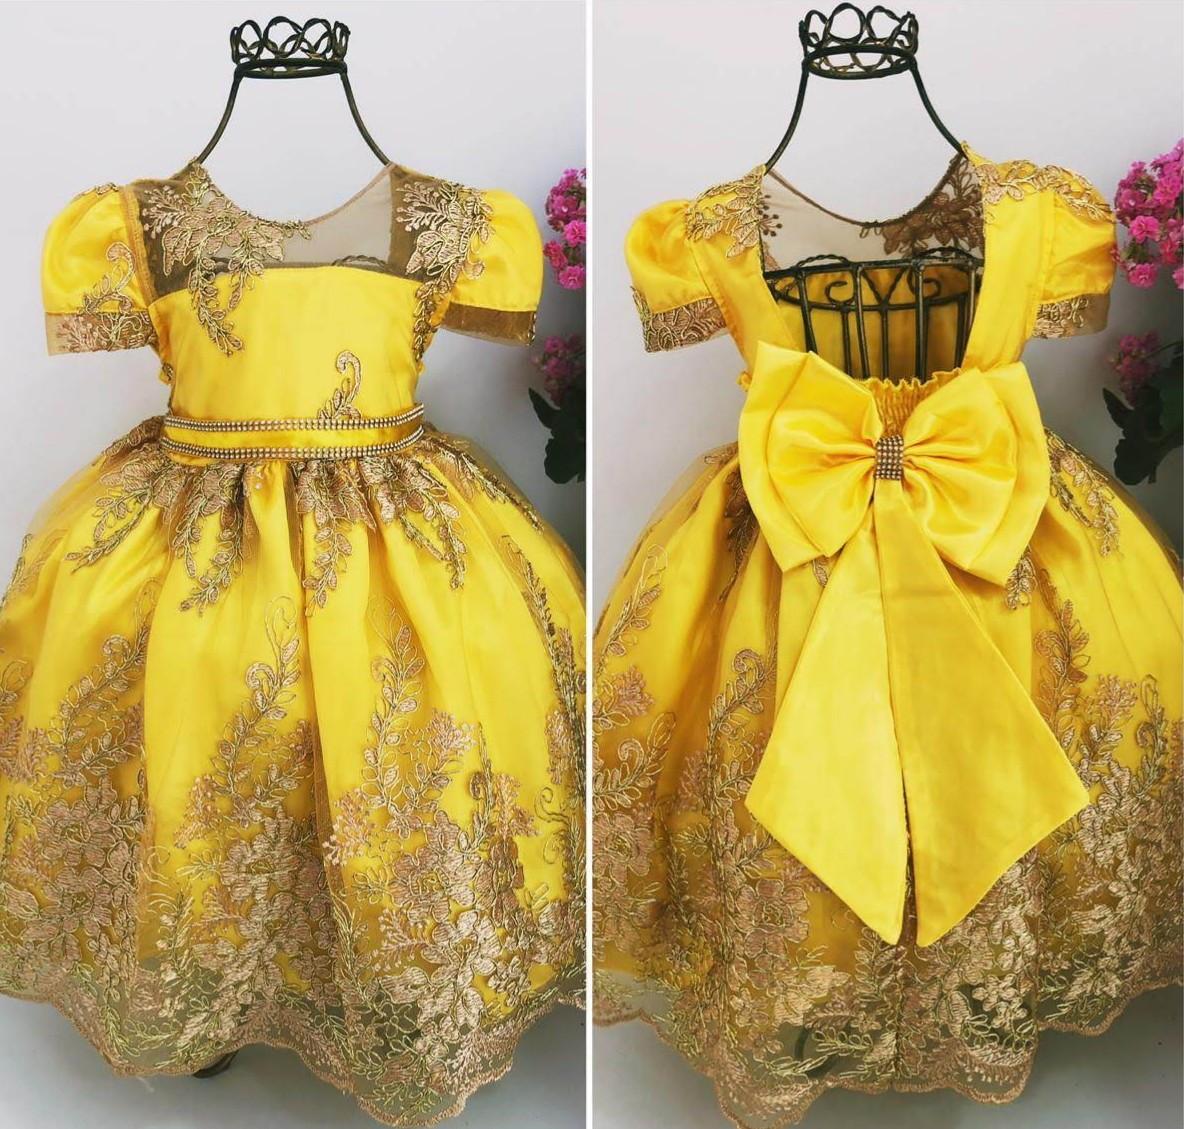 66568a6b81a Vestido Infantil da Bela e Fera Luxo